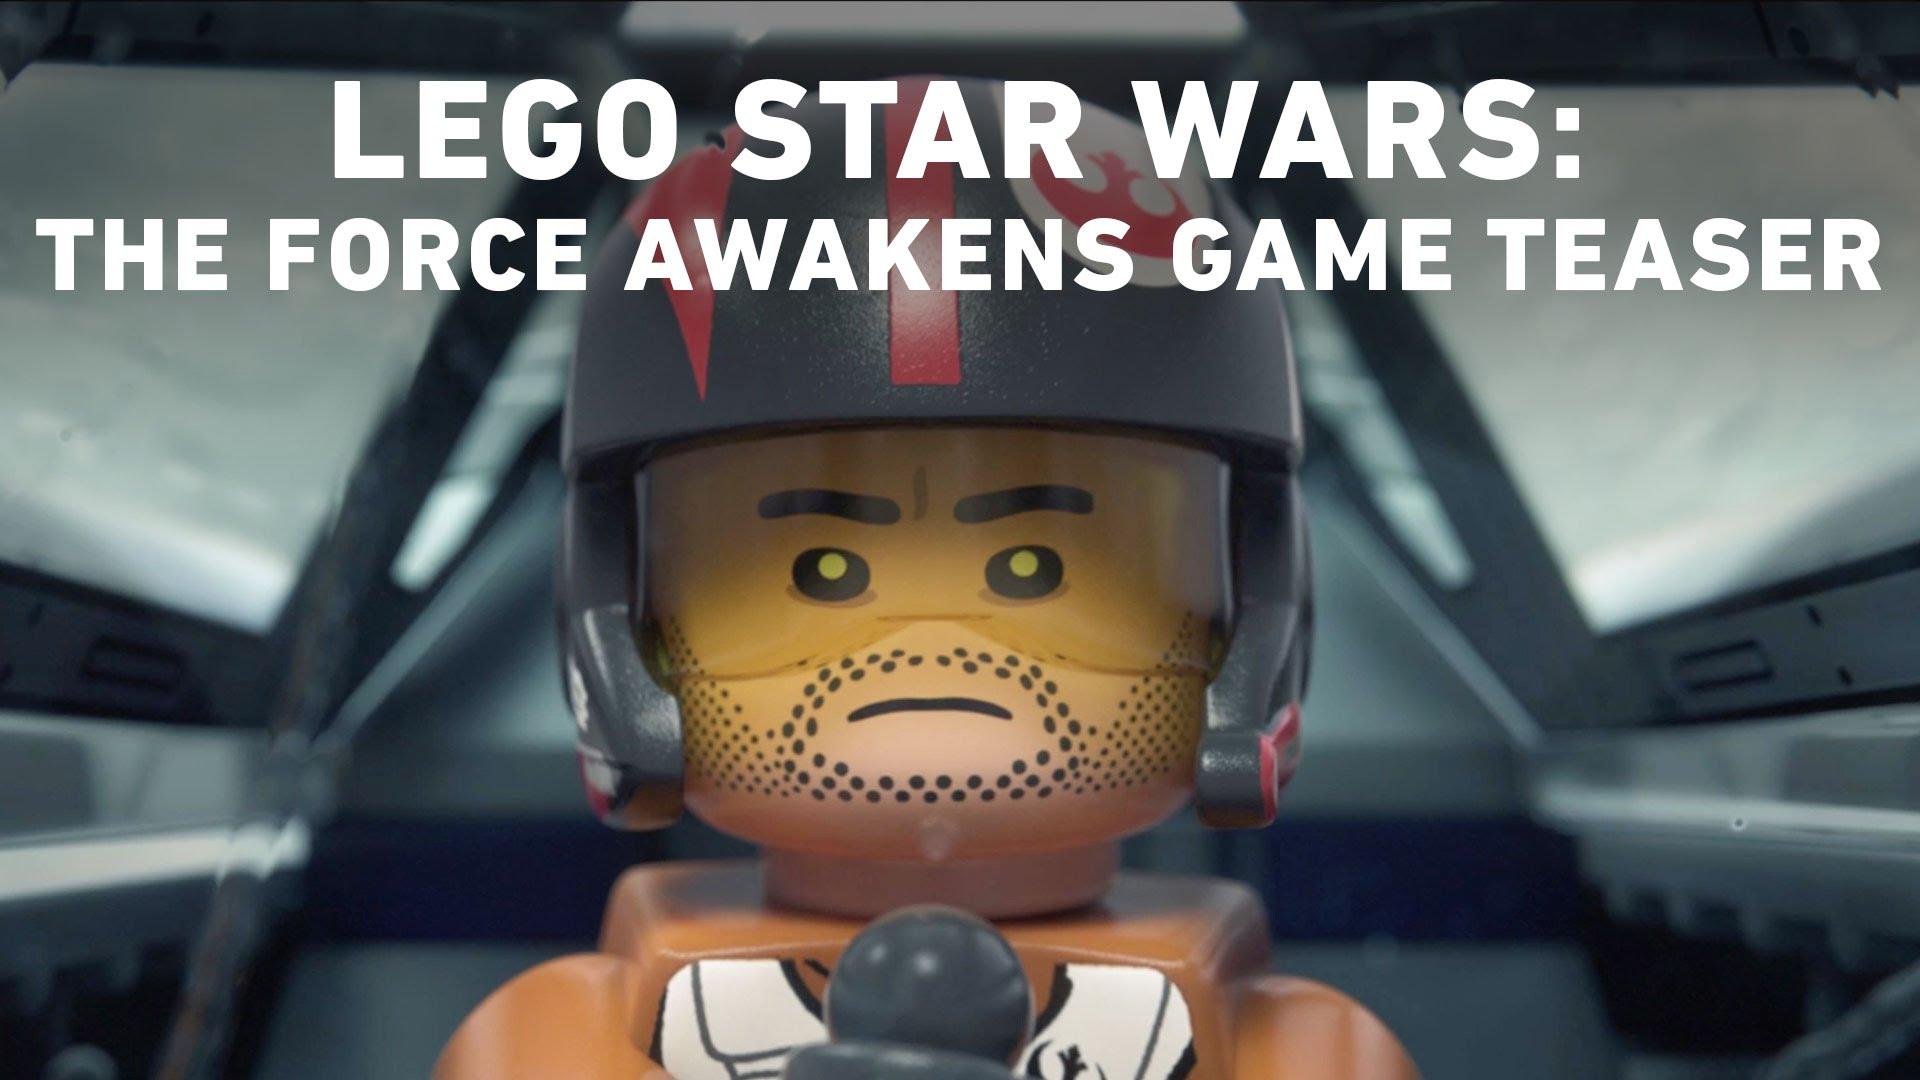 LEGO Star Wars: The Force Awakens Video Game – Announce Teaser Trailer